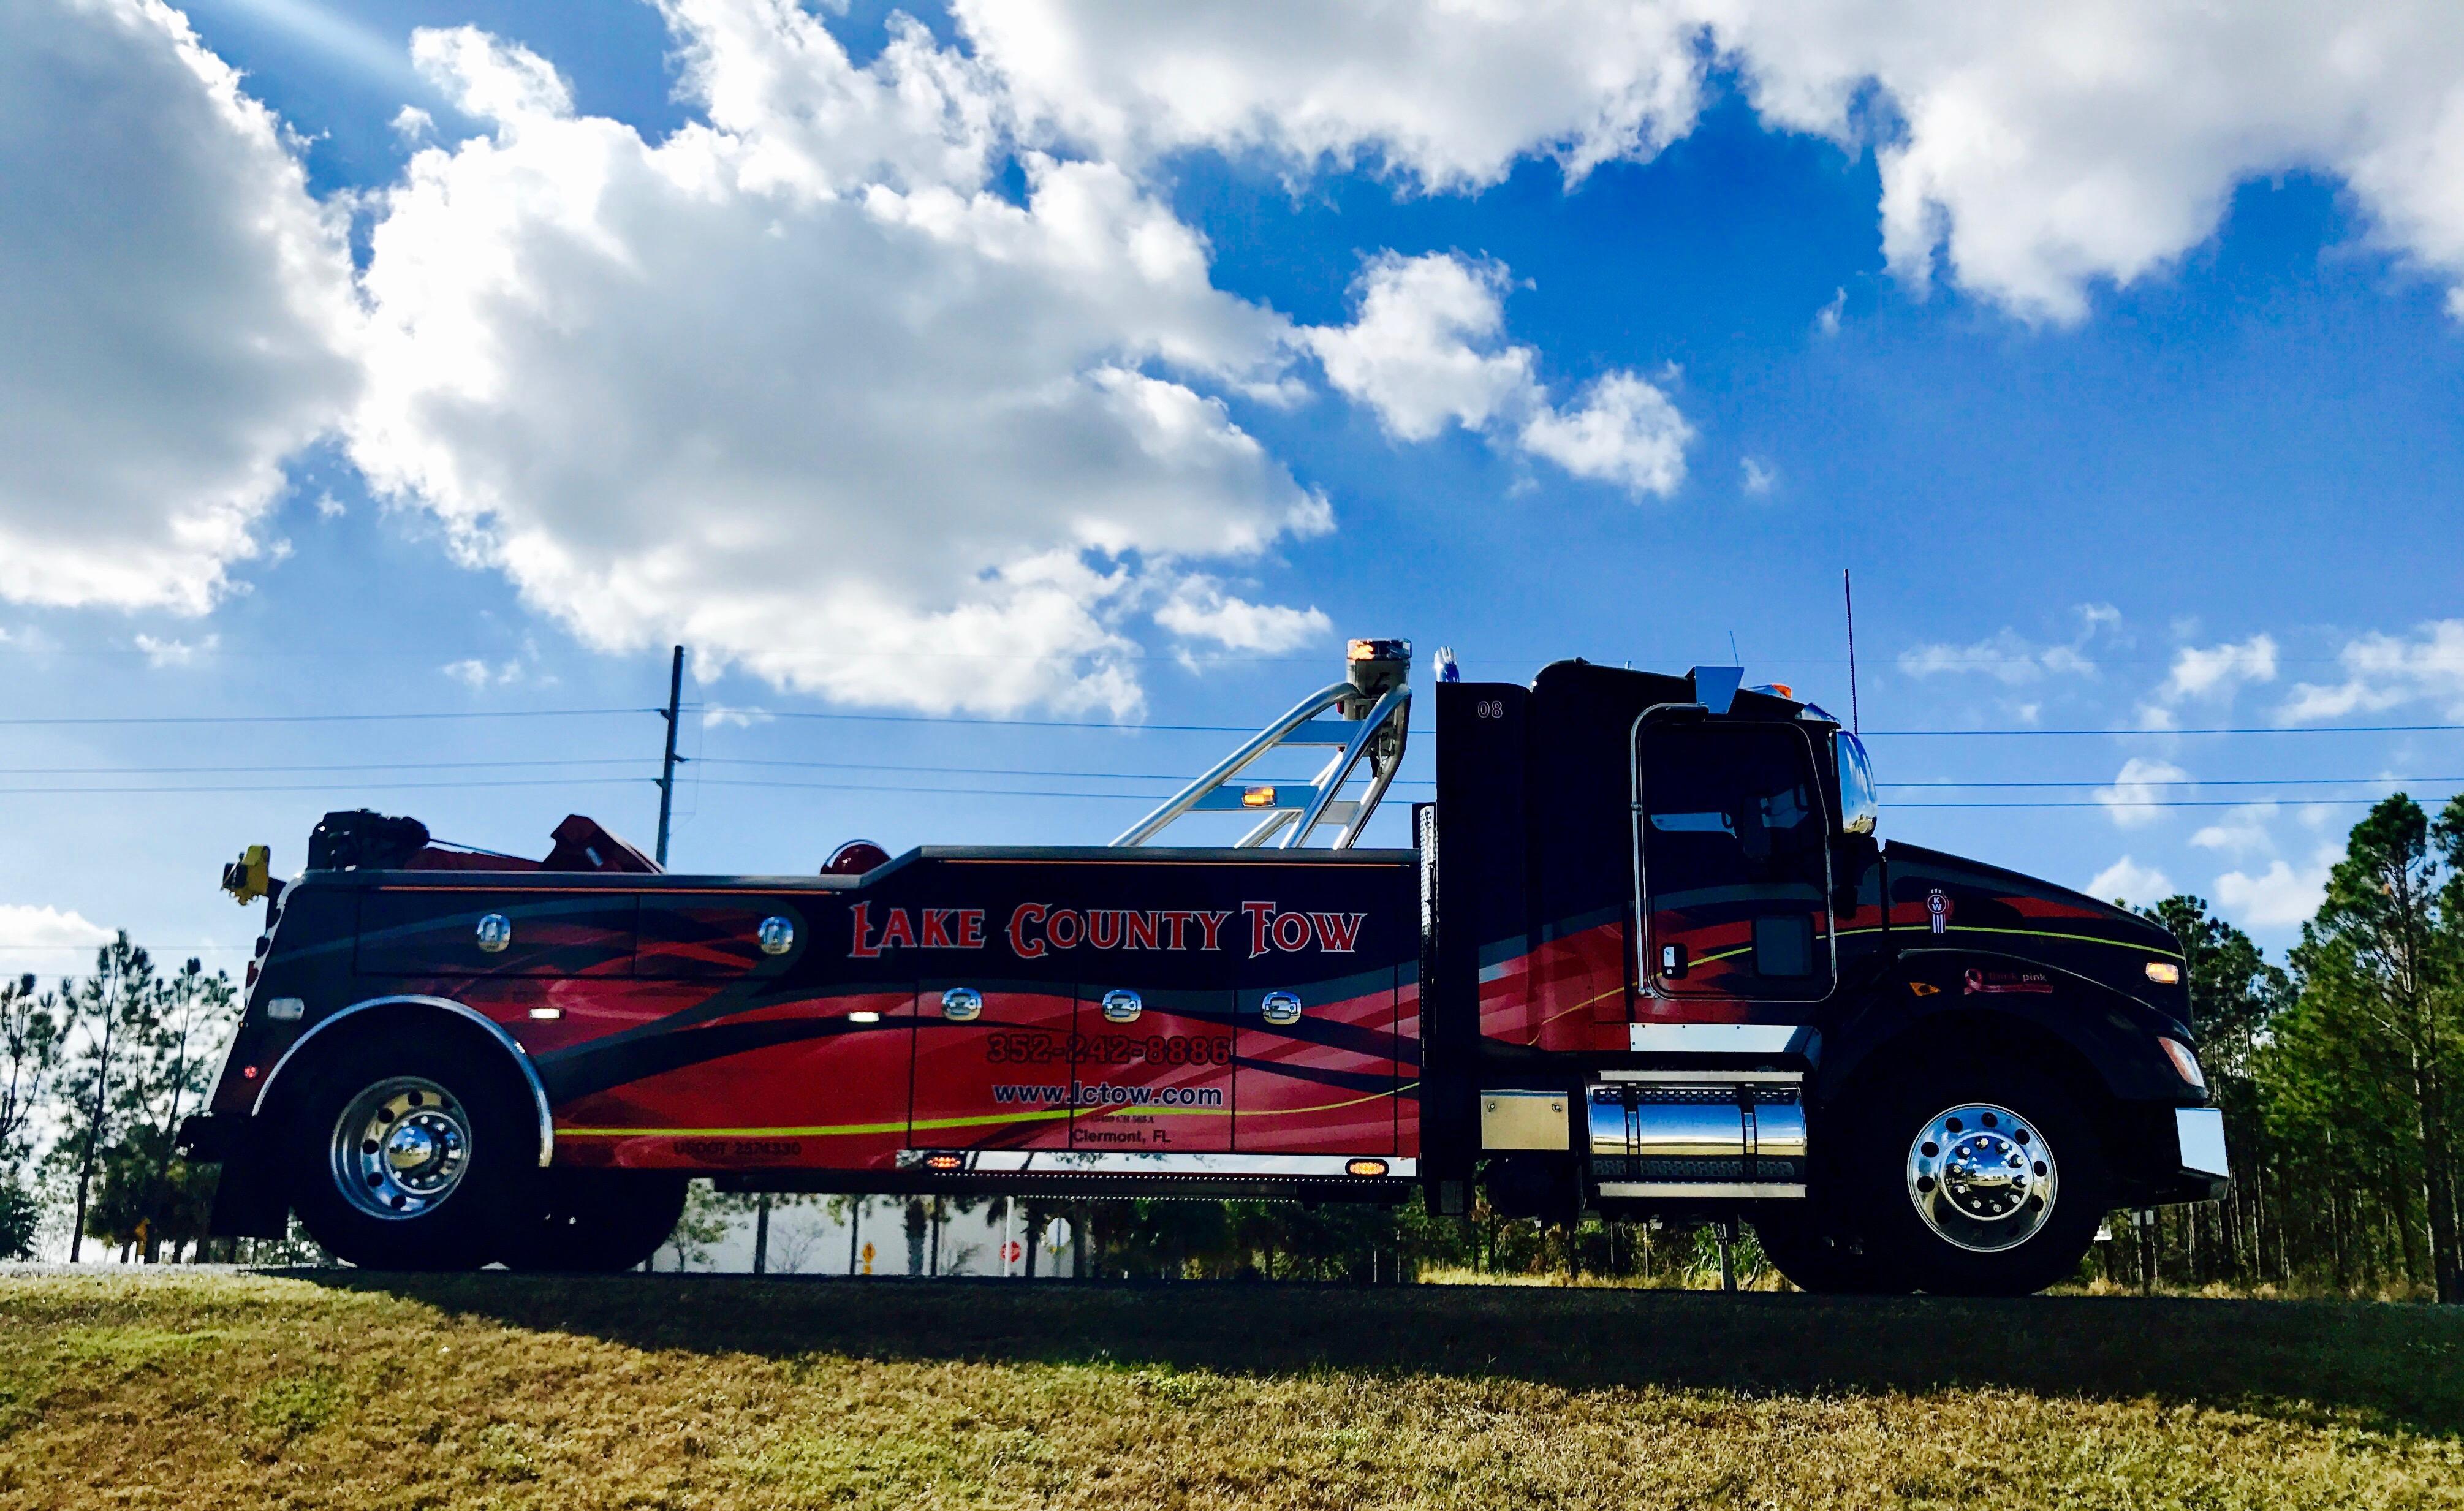 Lake County Tow image 3